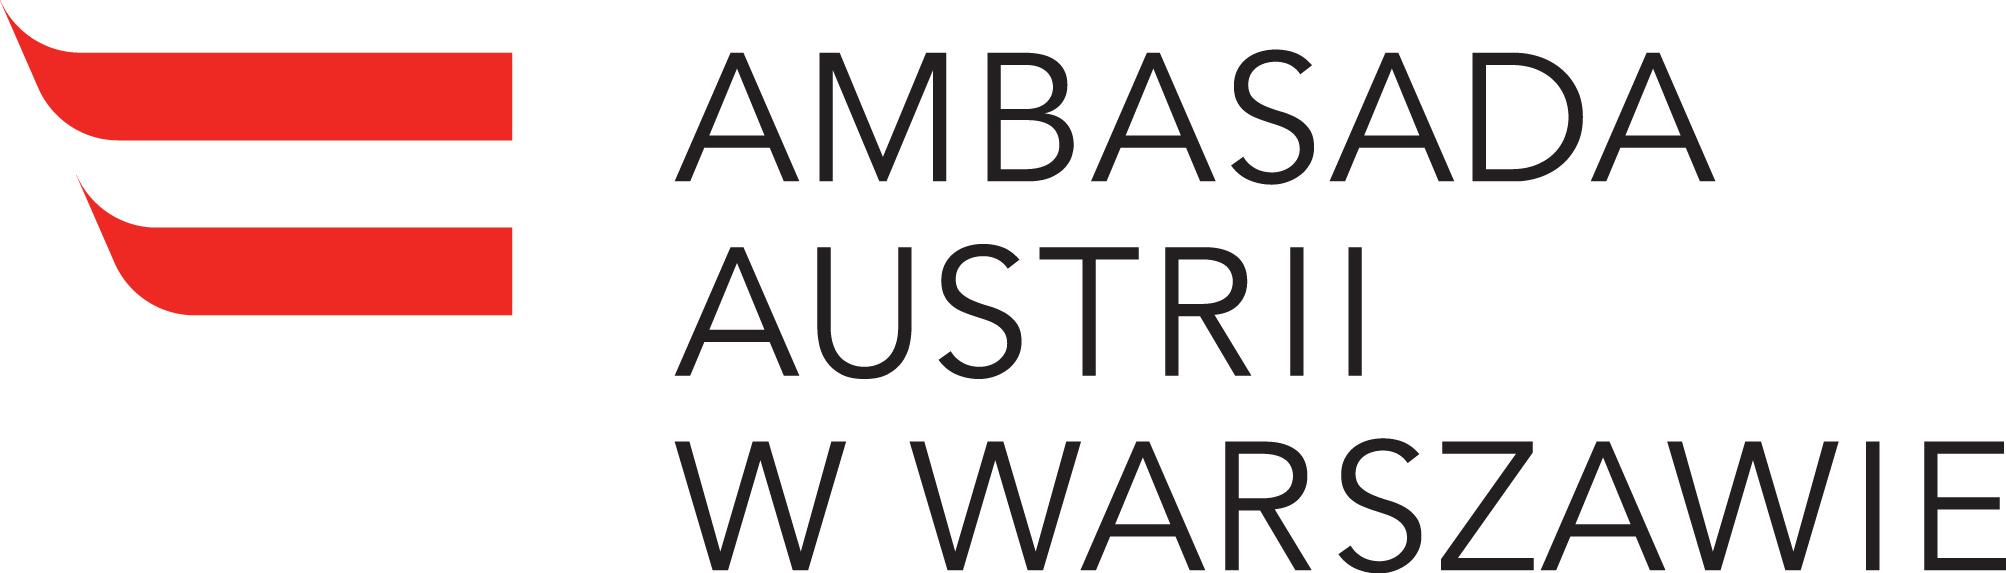 Ambasada Austrii